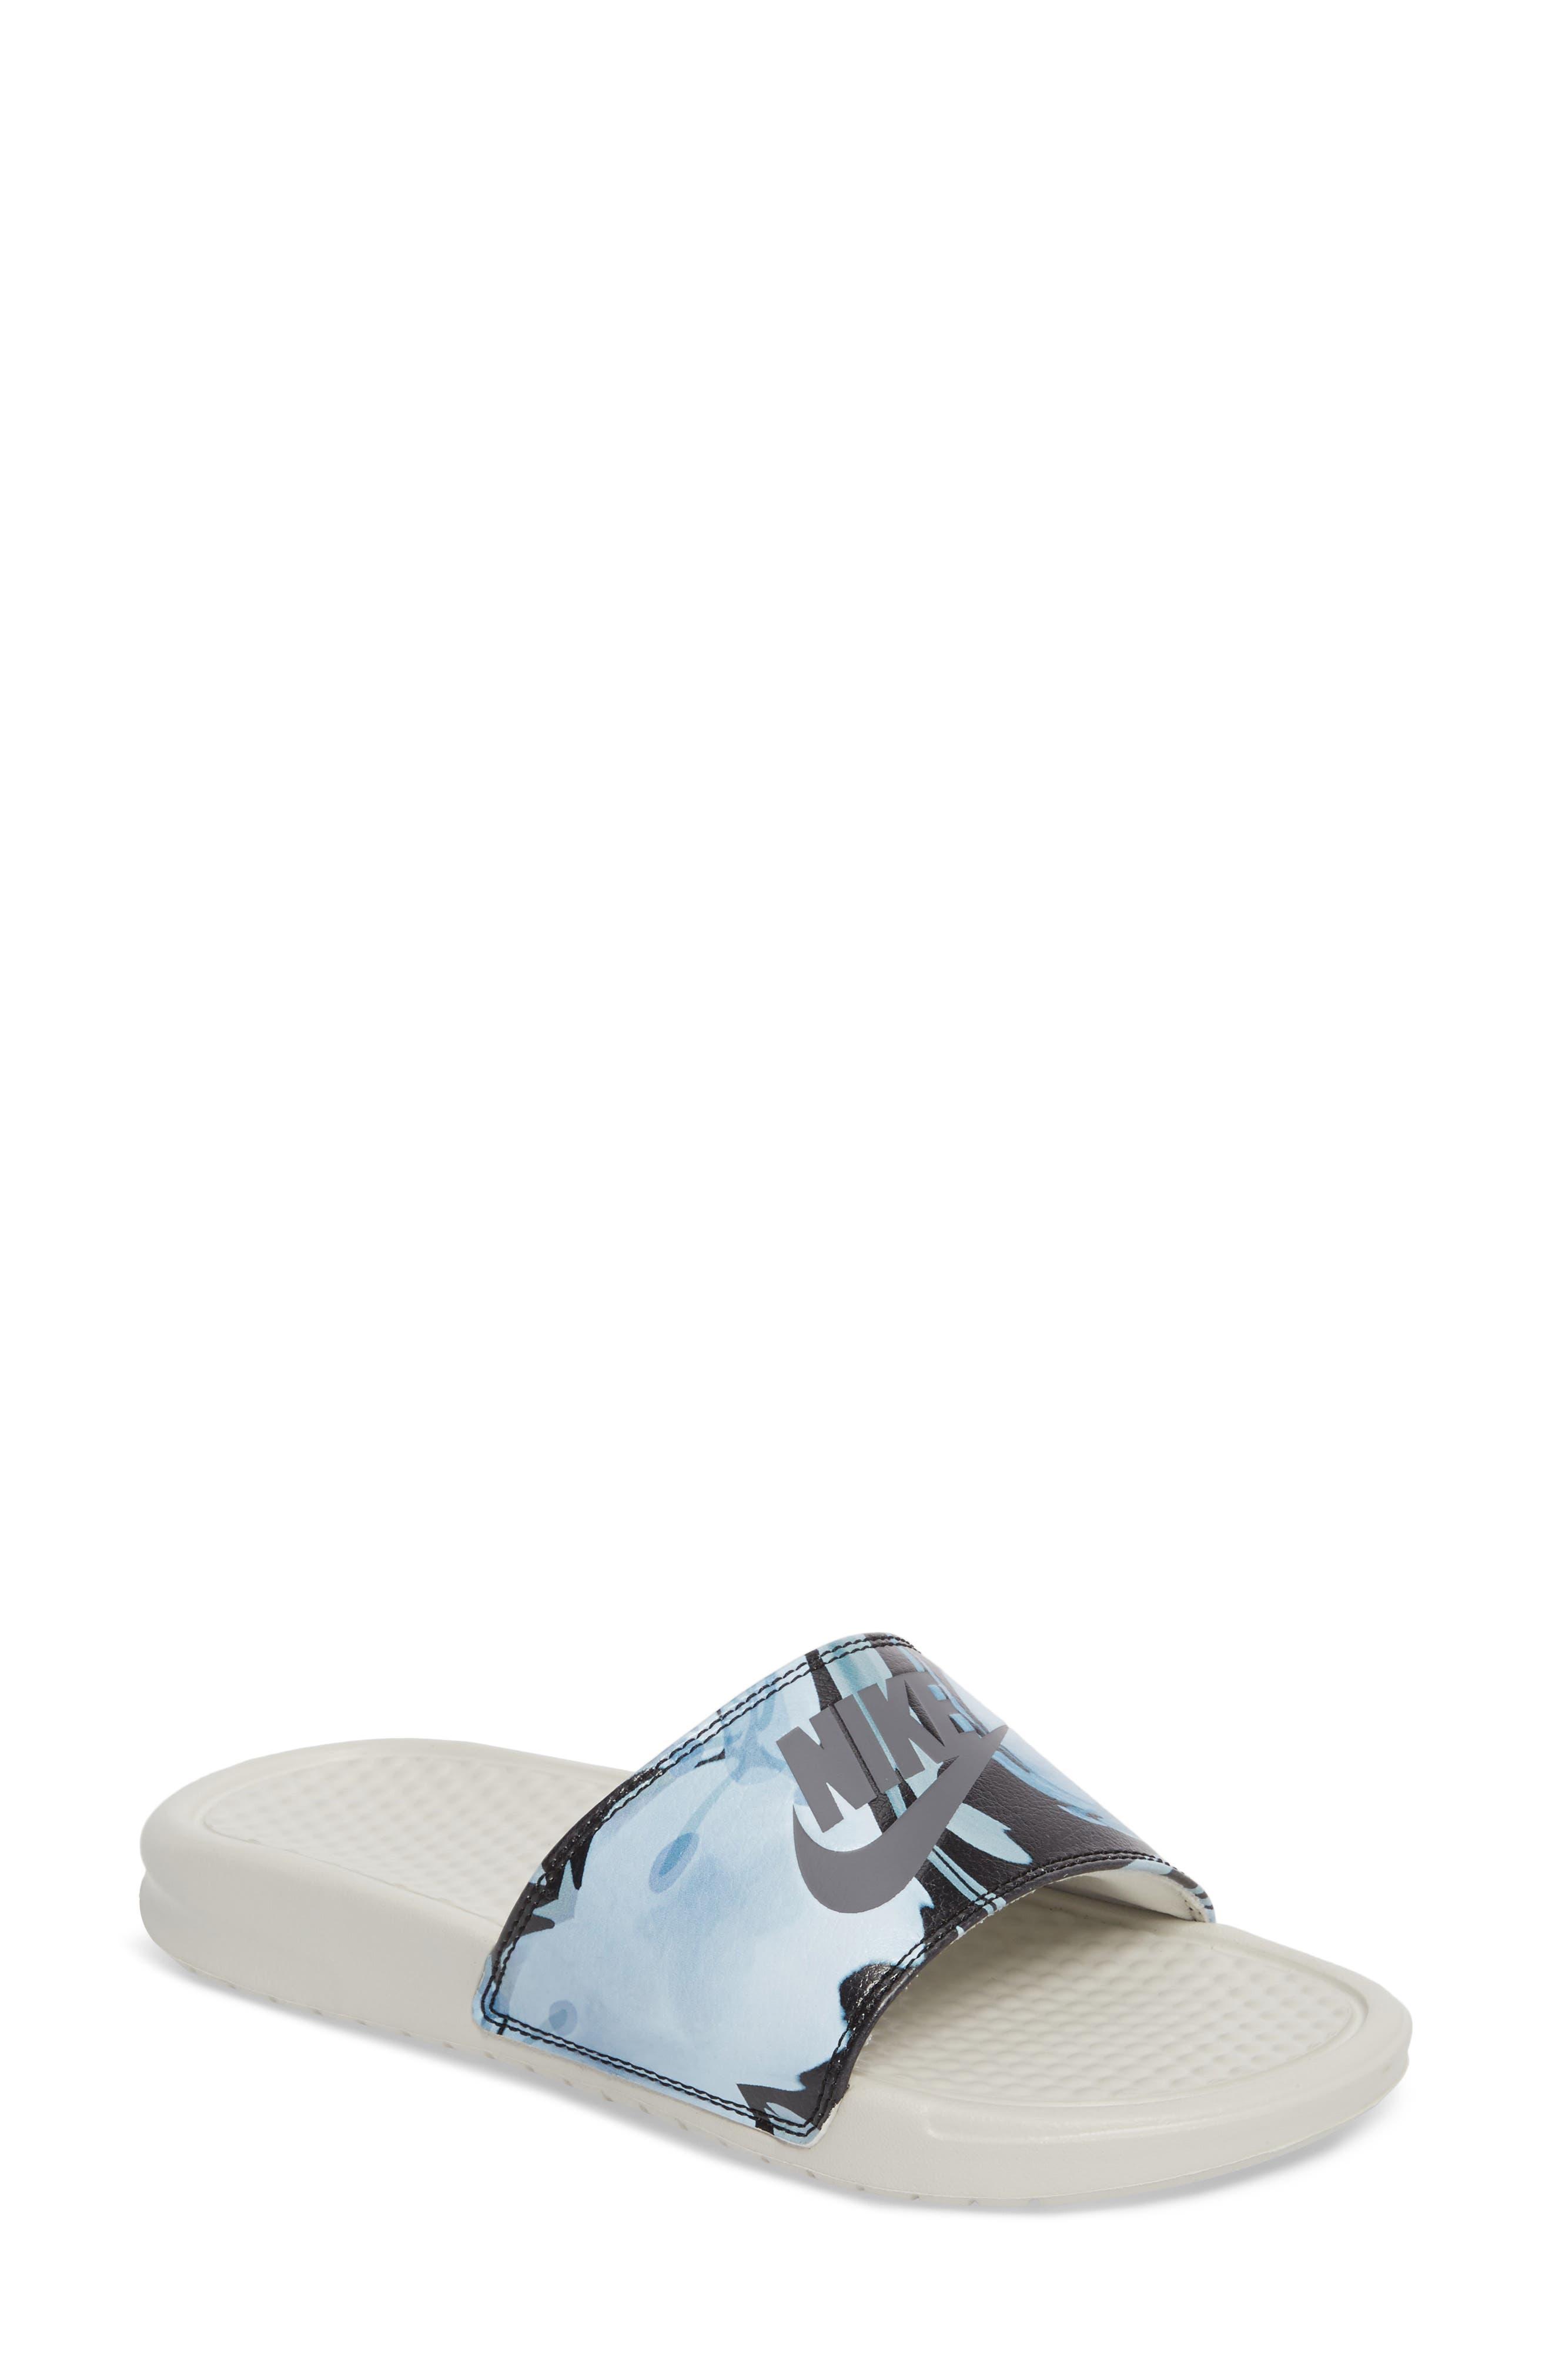 Alternate Image 1 Selected - Nike 'Benassi - Just Do It' Print Sandal (Women)